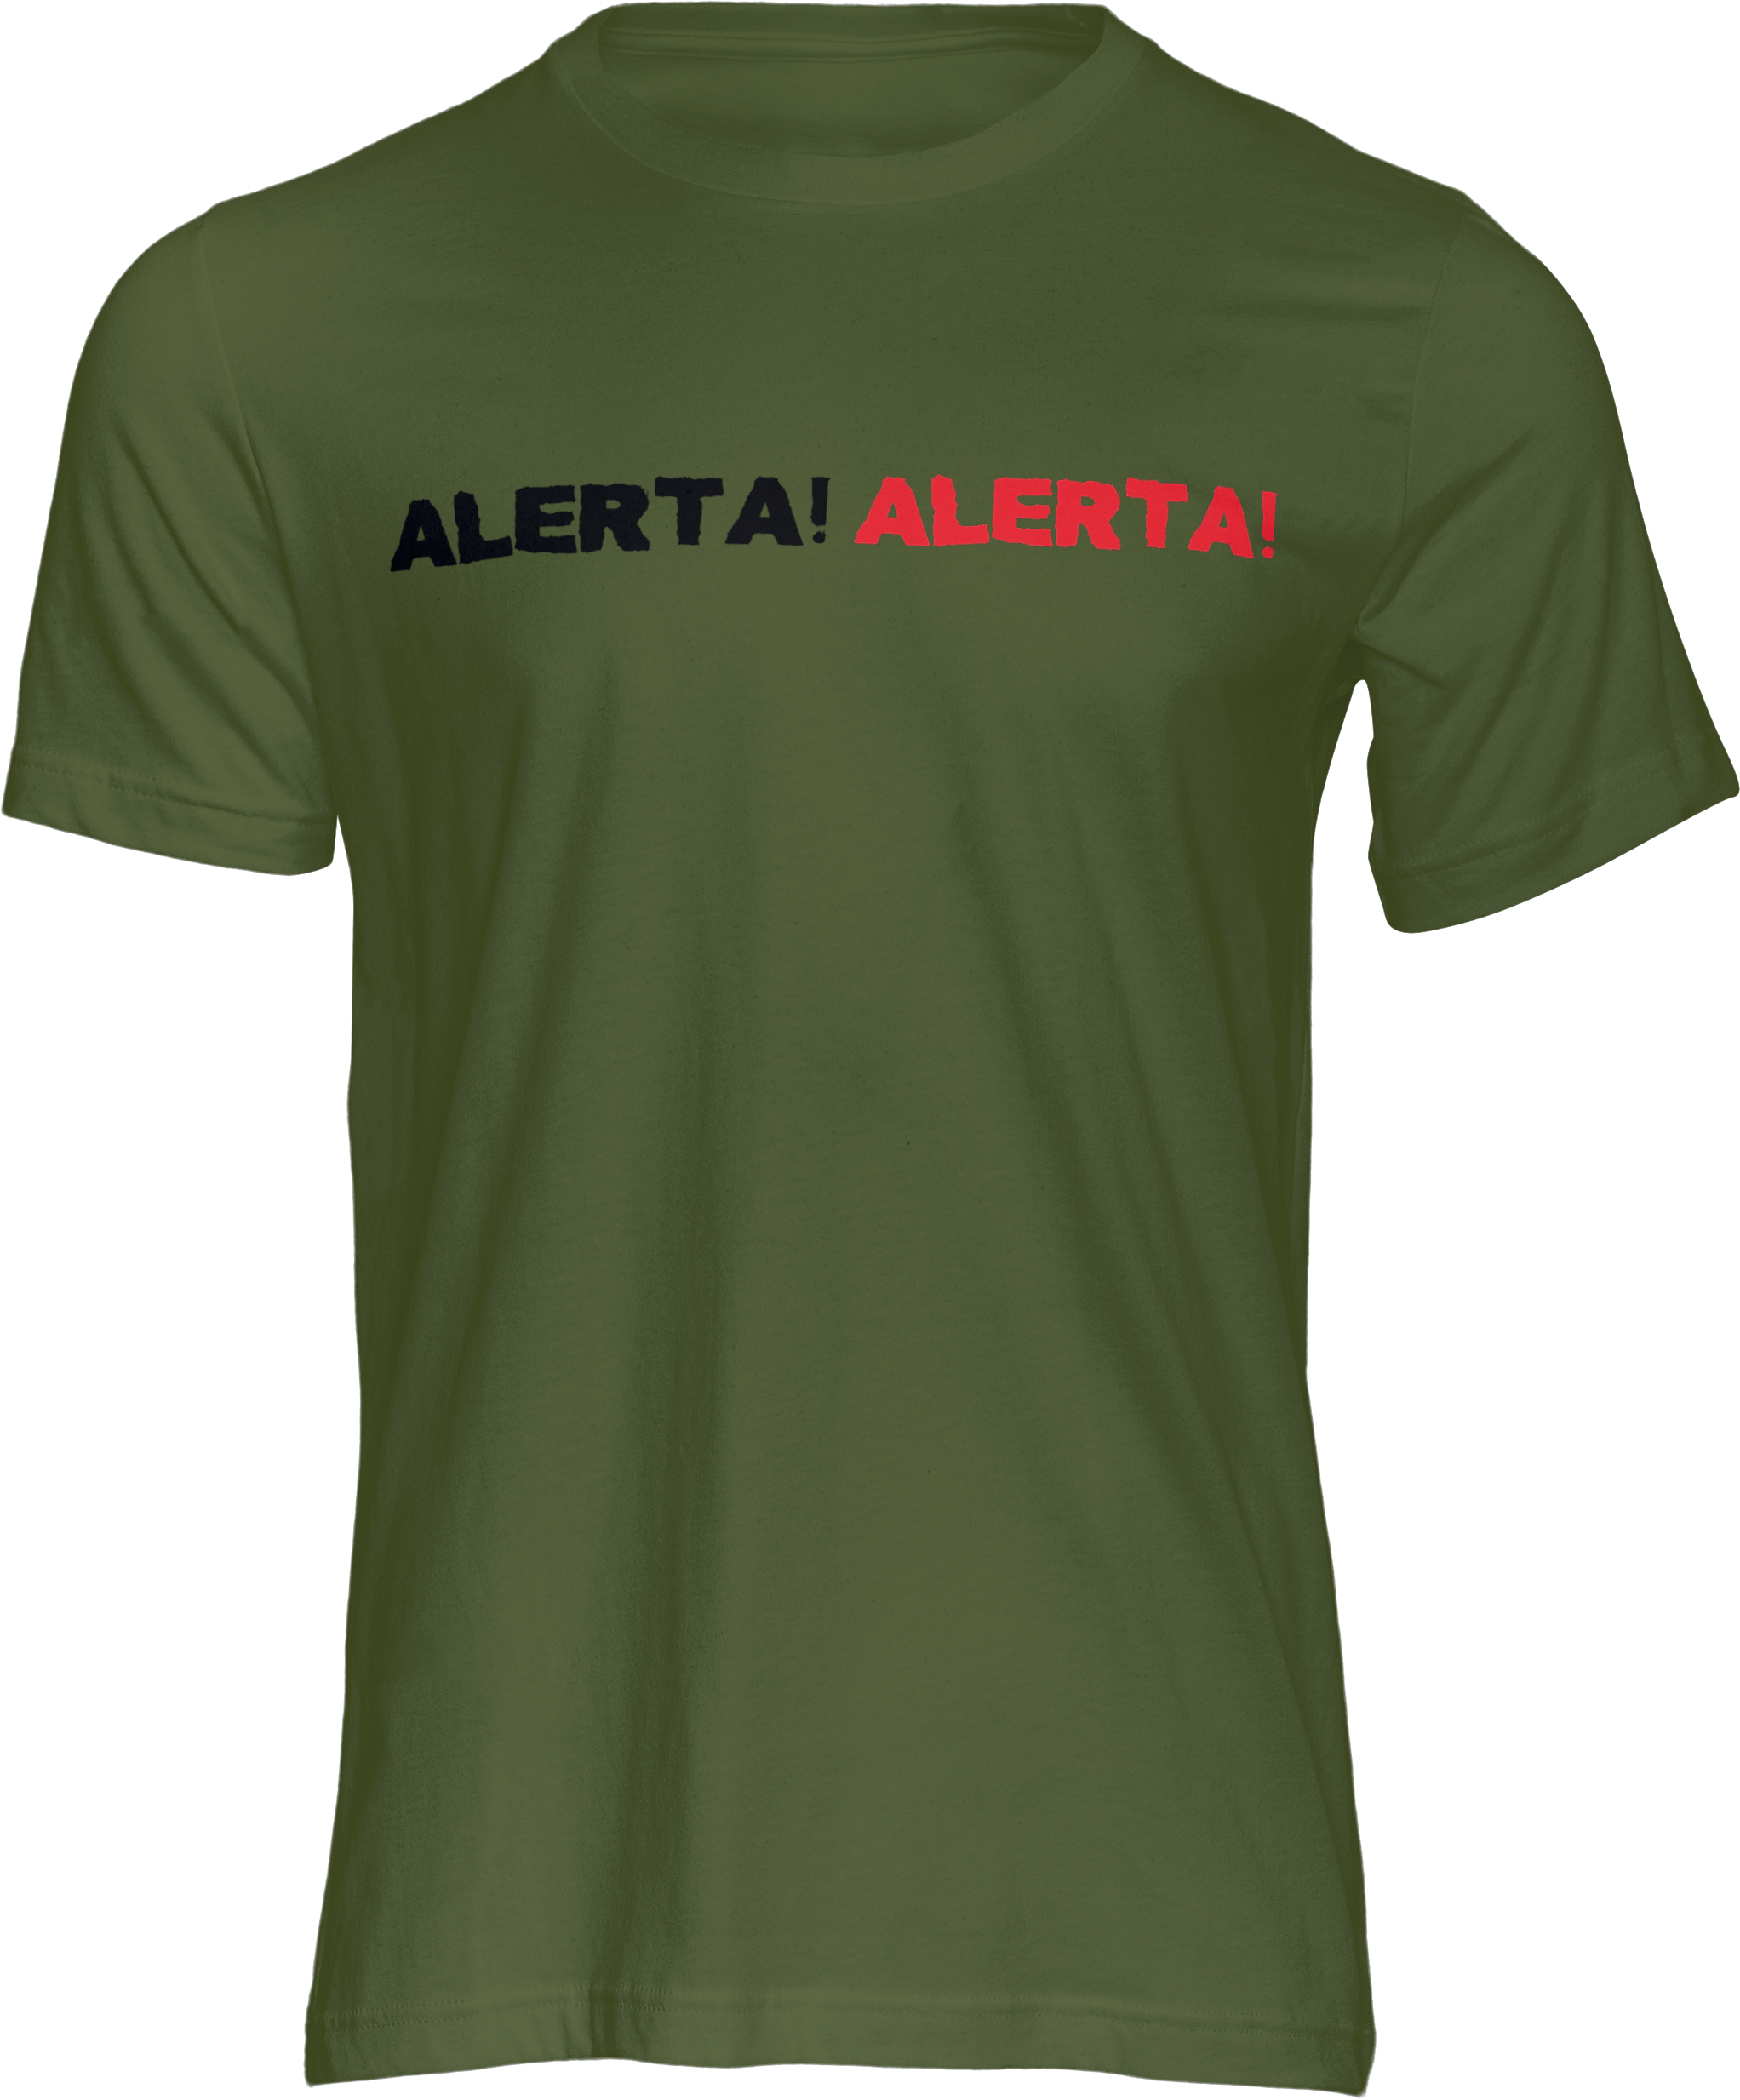 Motiv-Shirt – Alerta Alerta – T-Shirt (grün)